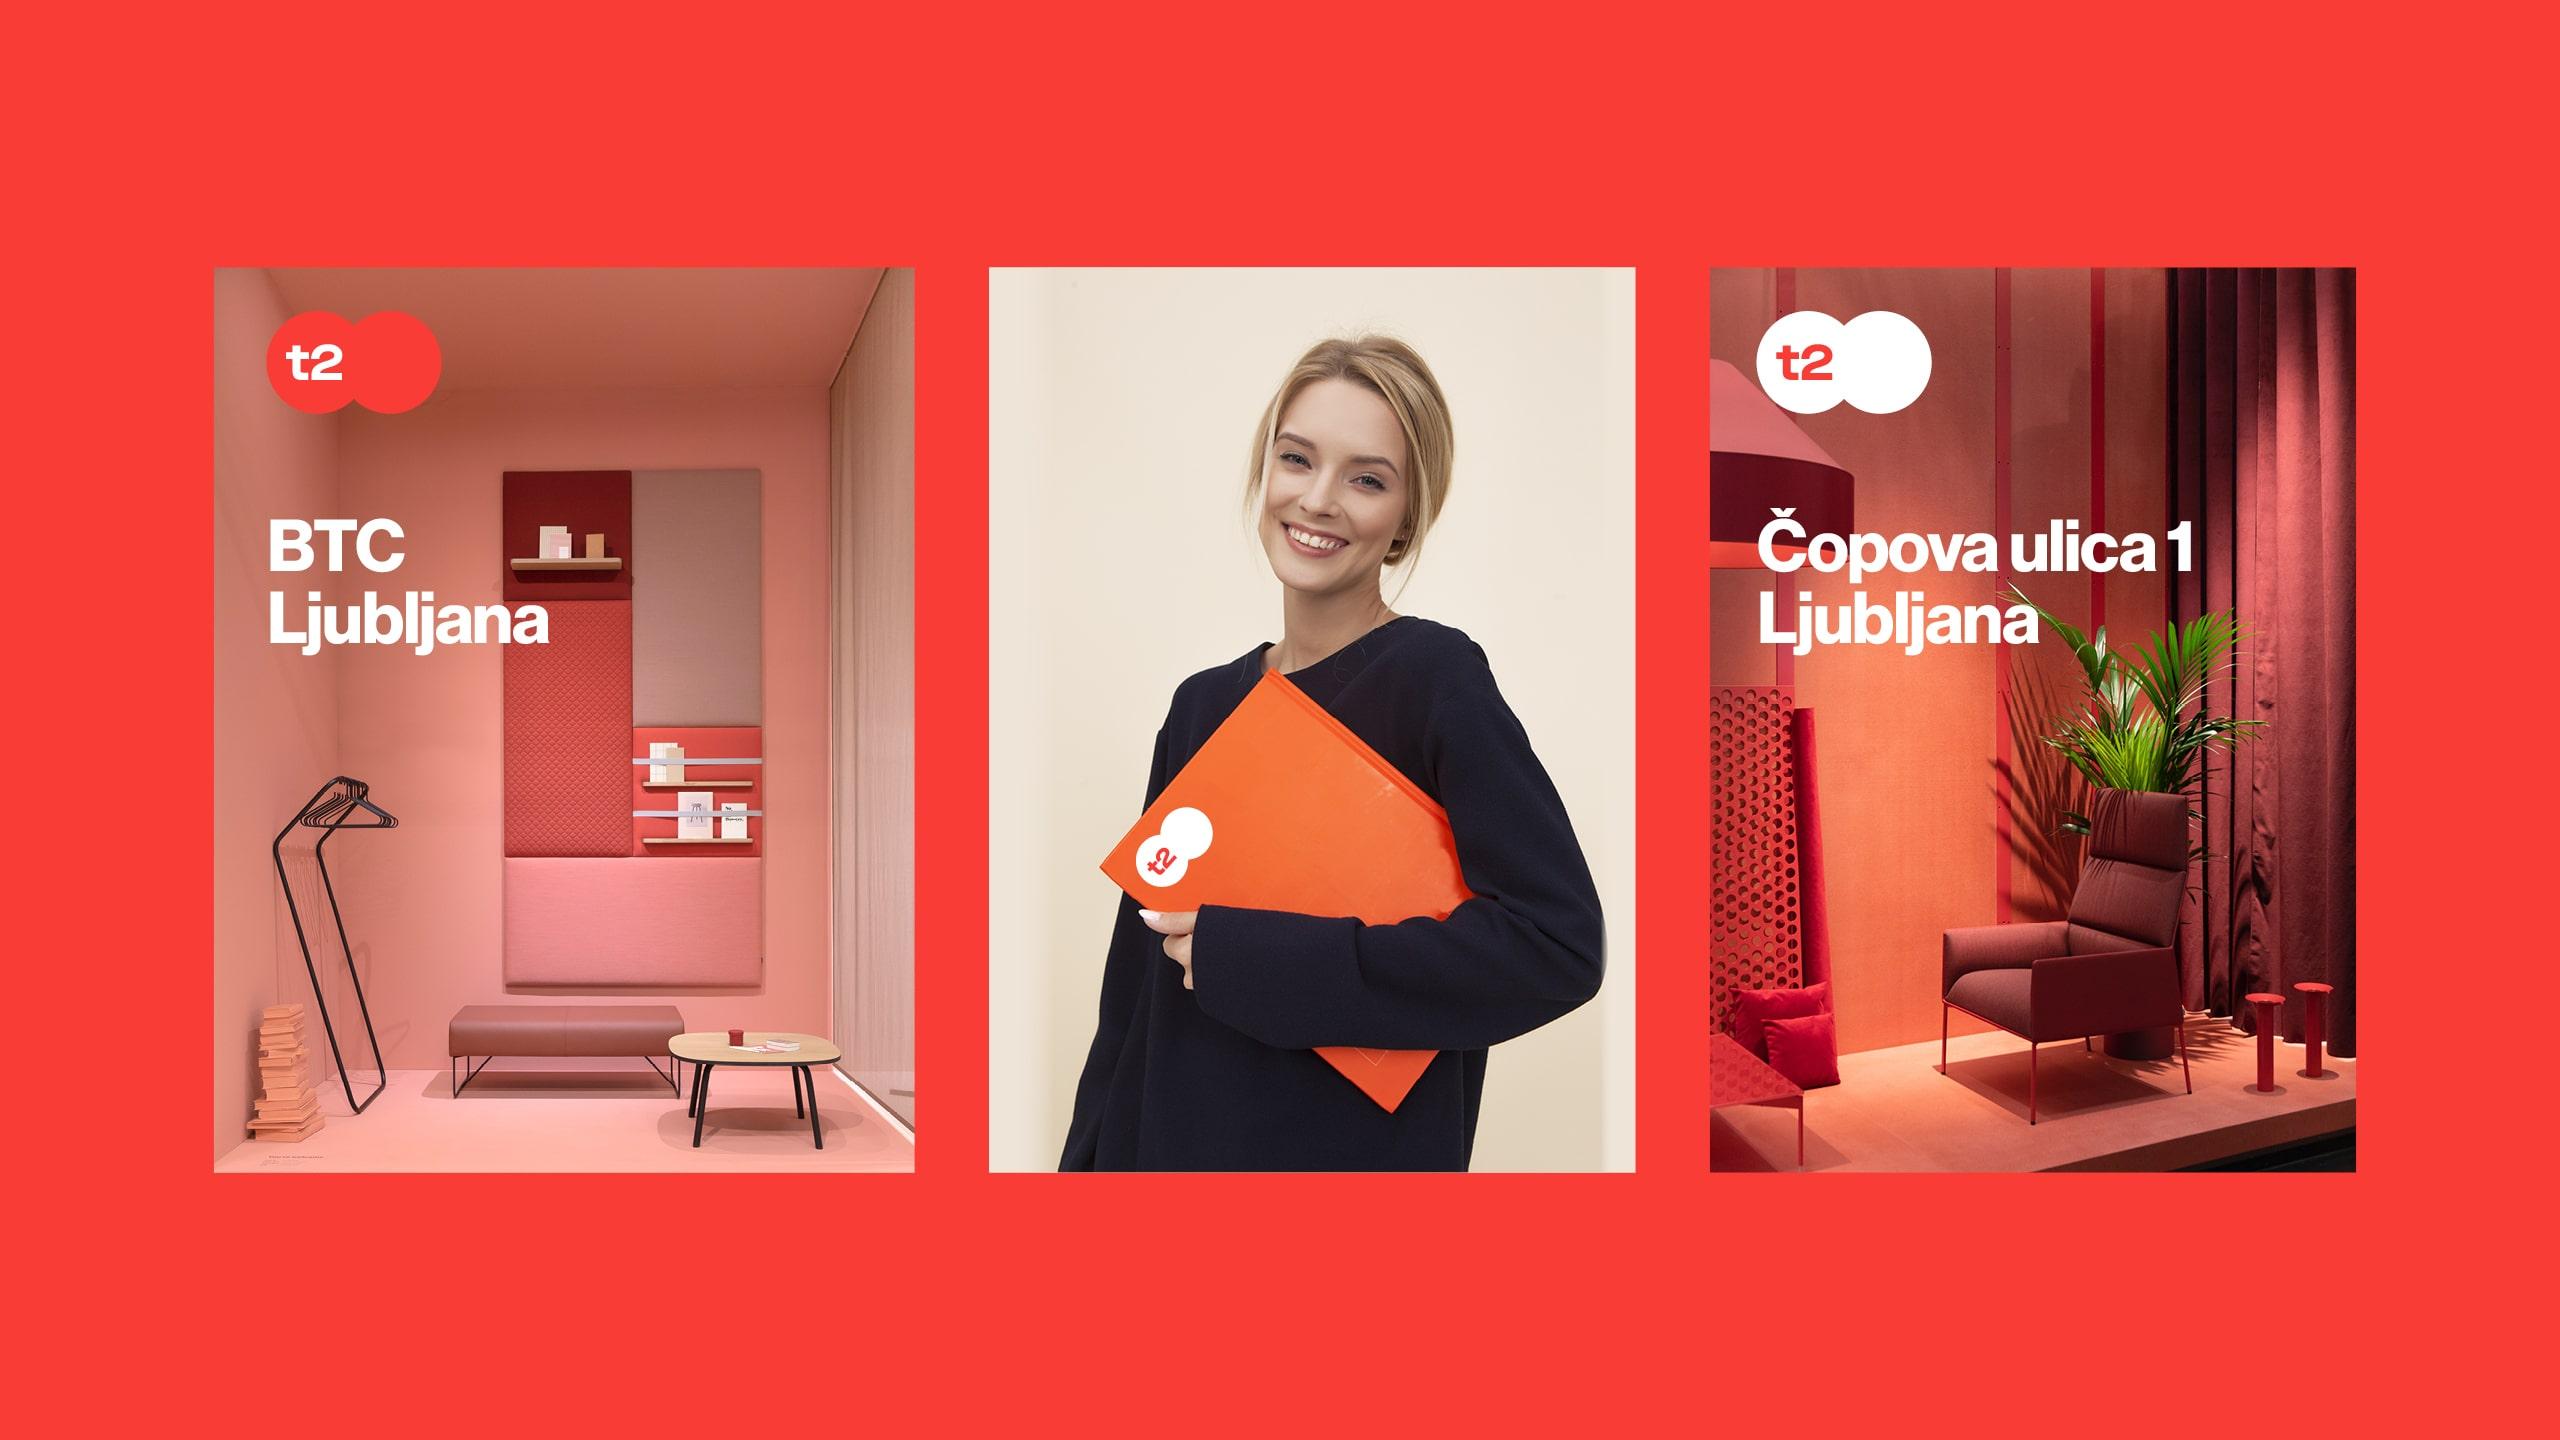 mantik-digital-branding-development-agency-creative-app-ui-web-branding-27-min